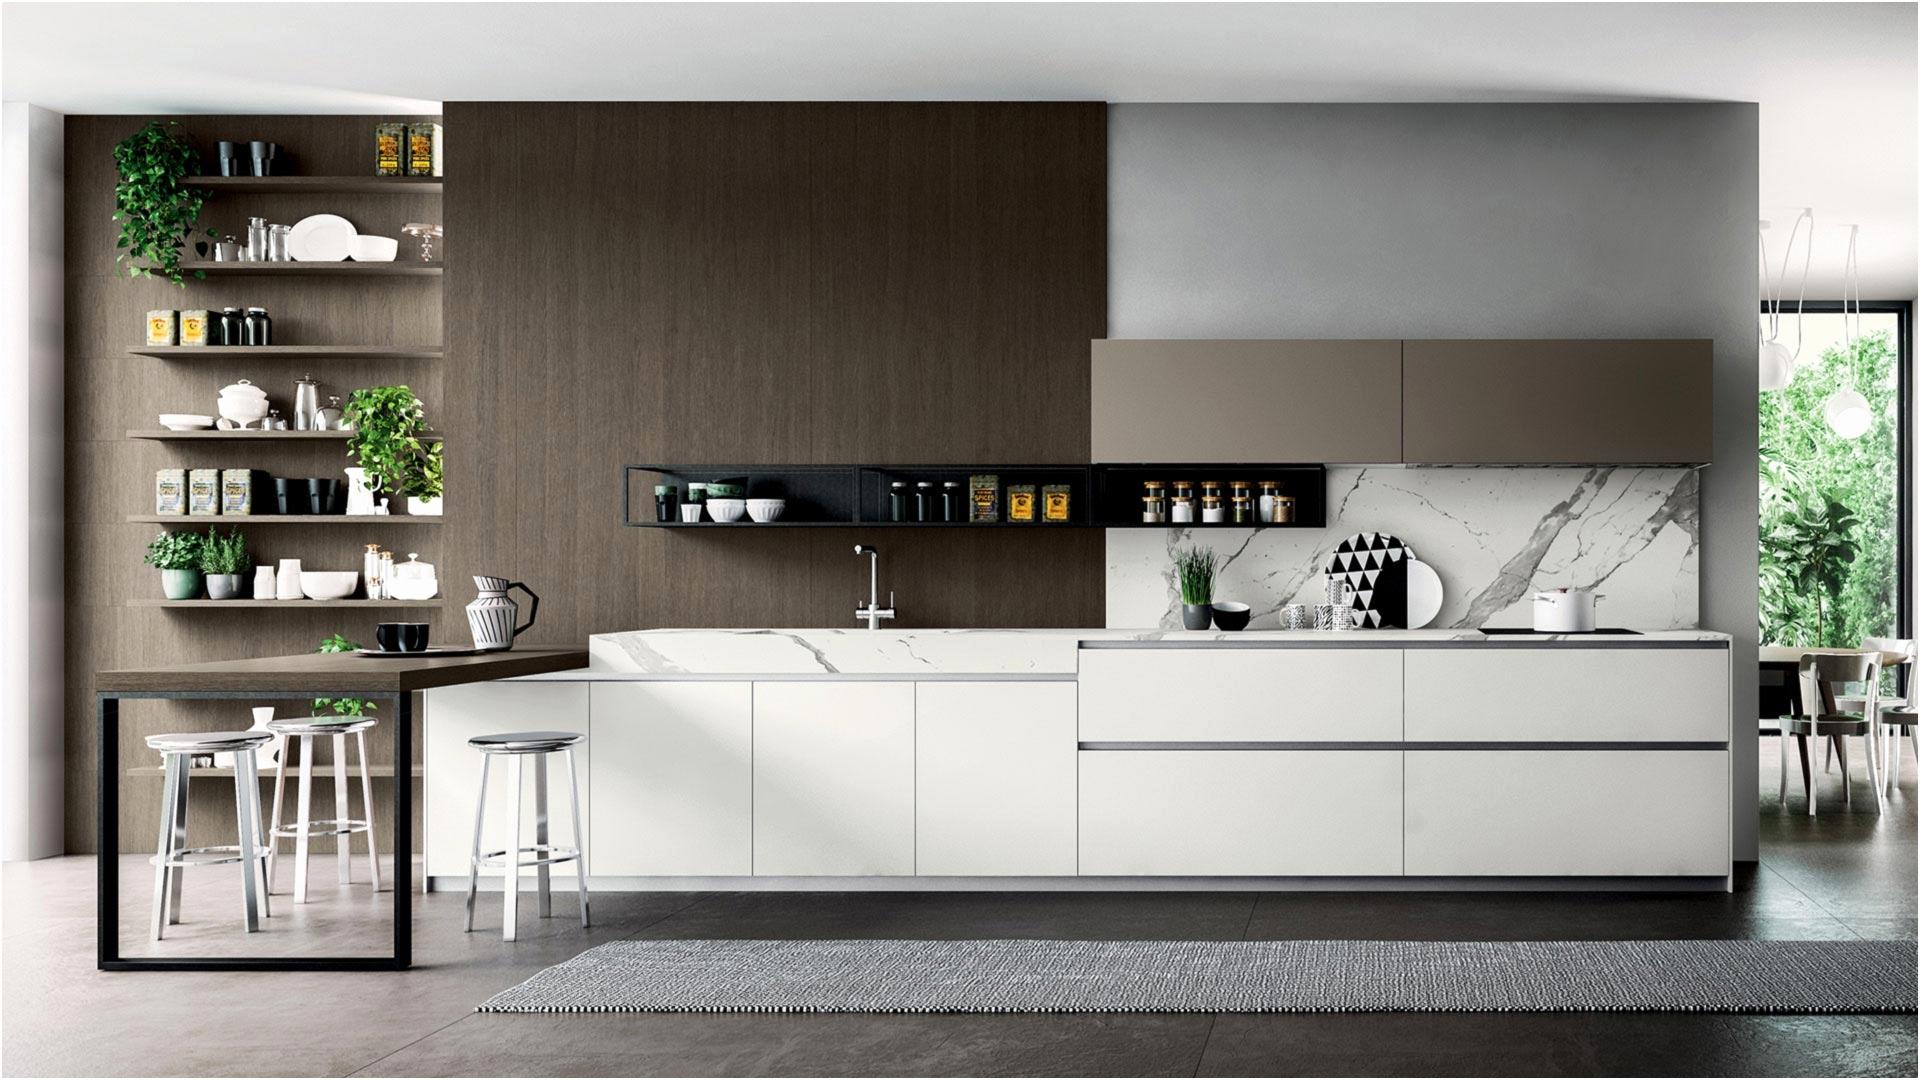 cucina in vetro Nuovo Cucine in vetro Armony cucine